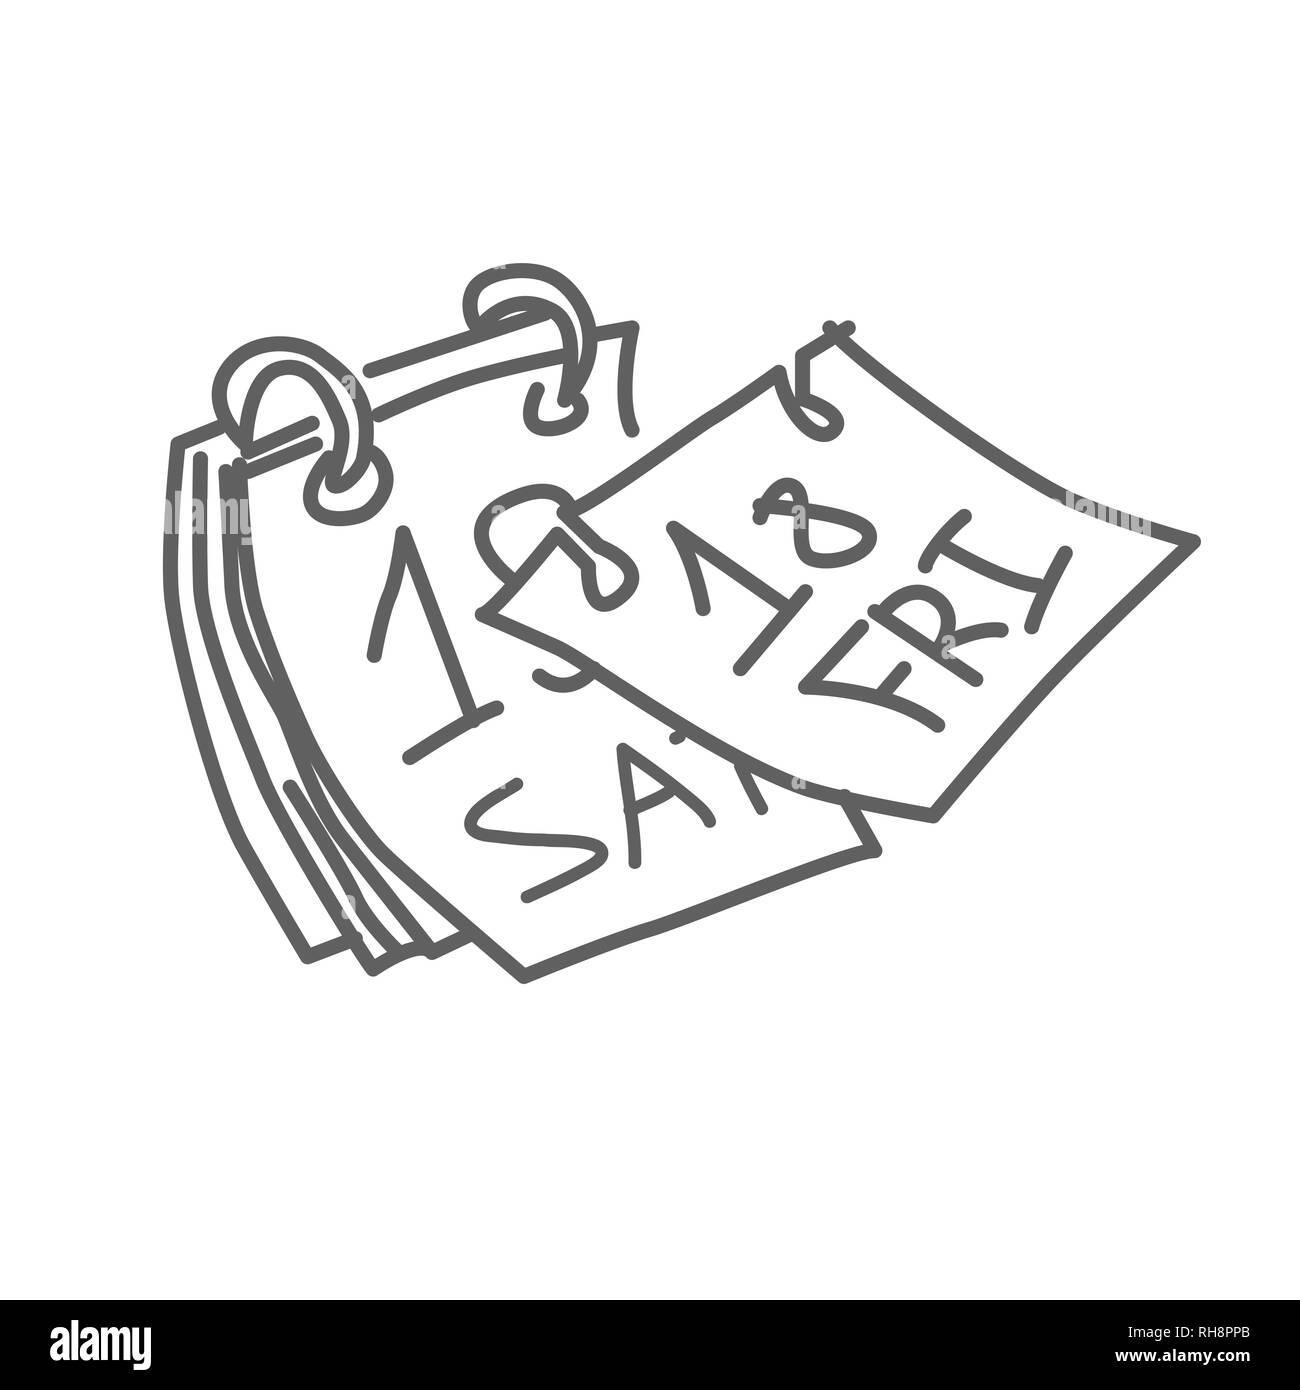 Tear-off calendar doodle vector illustration - Stock Image